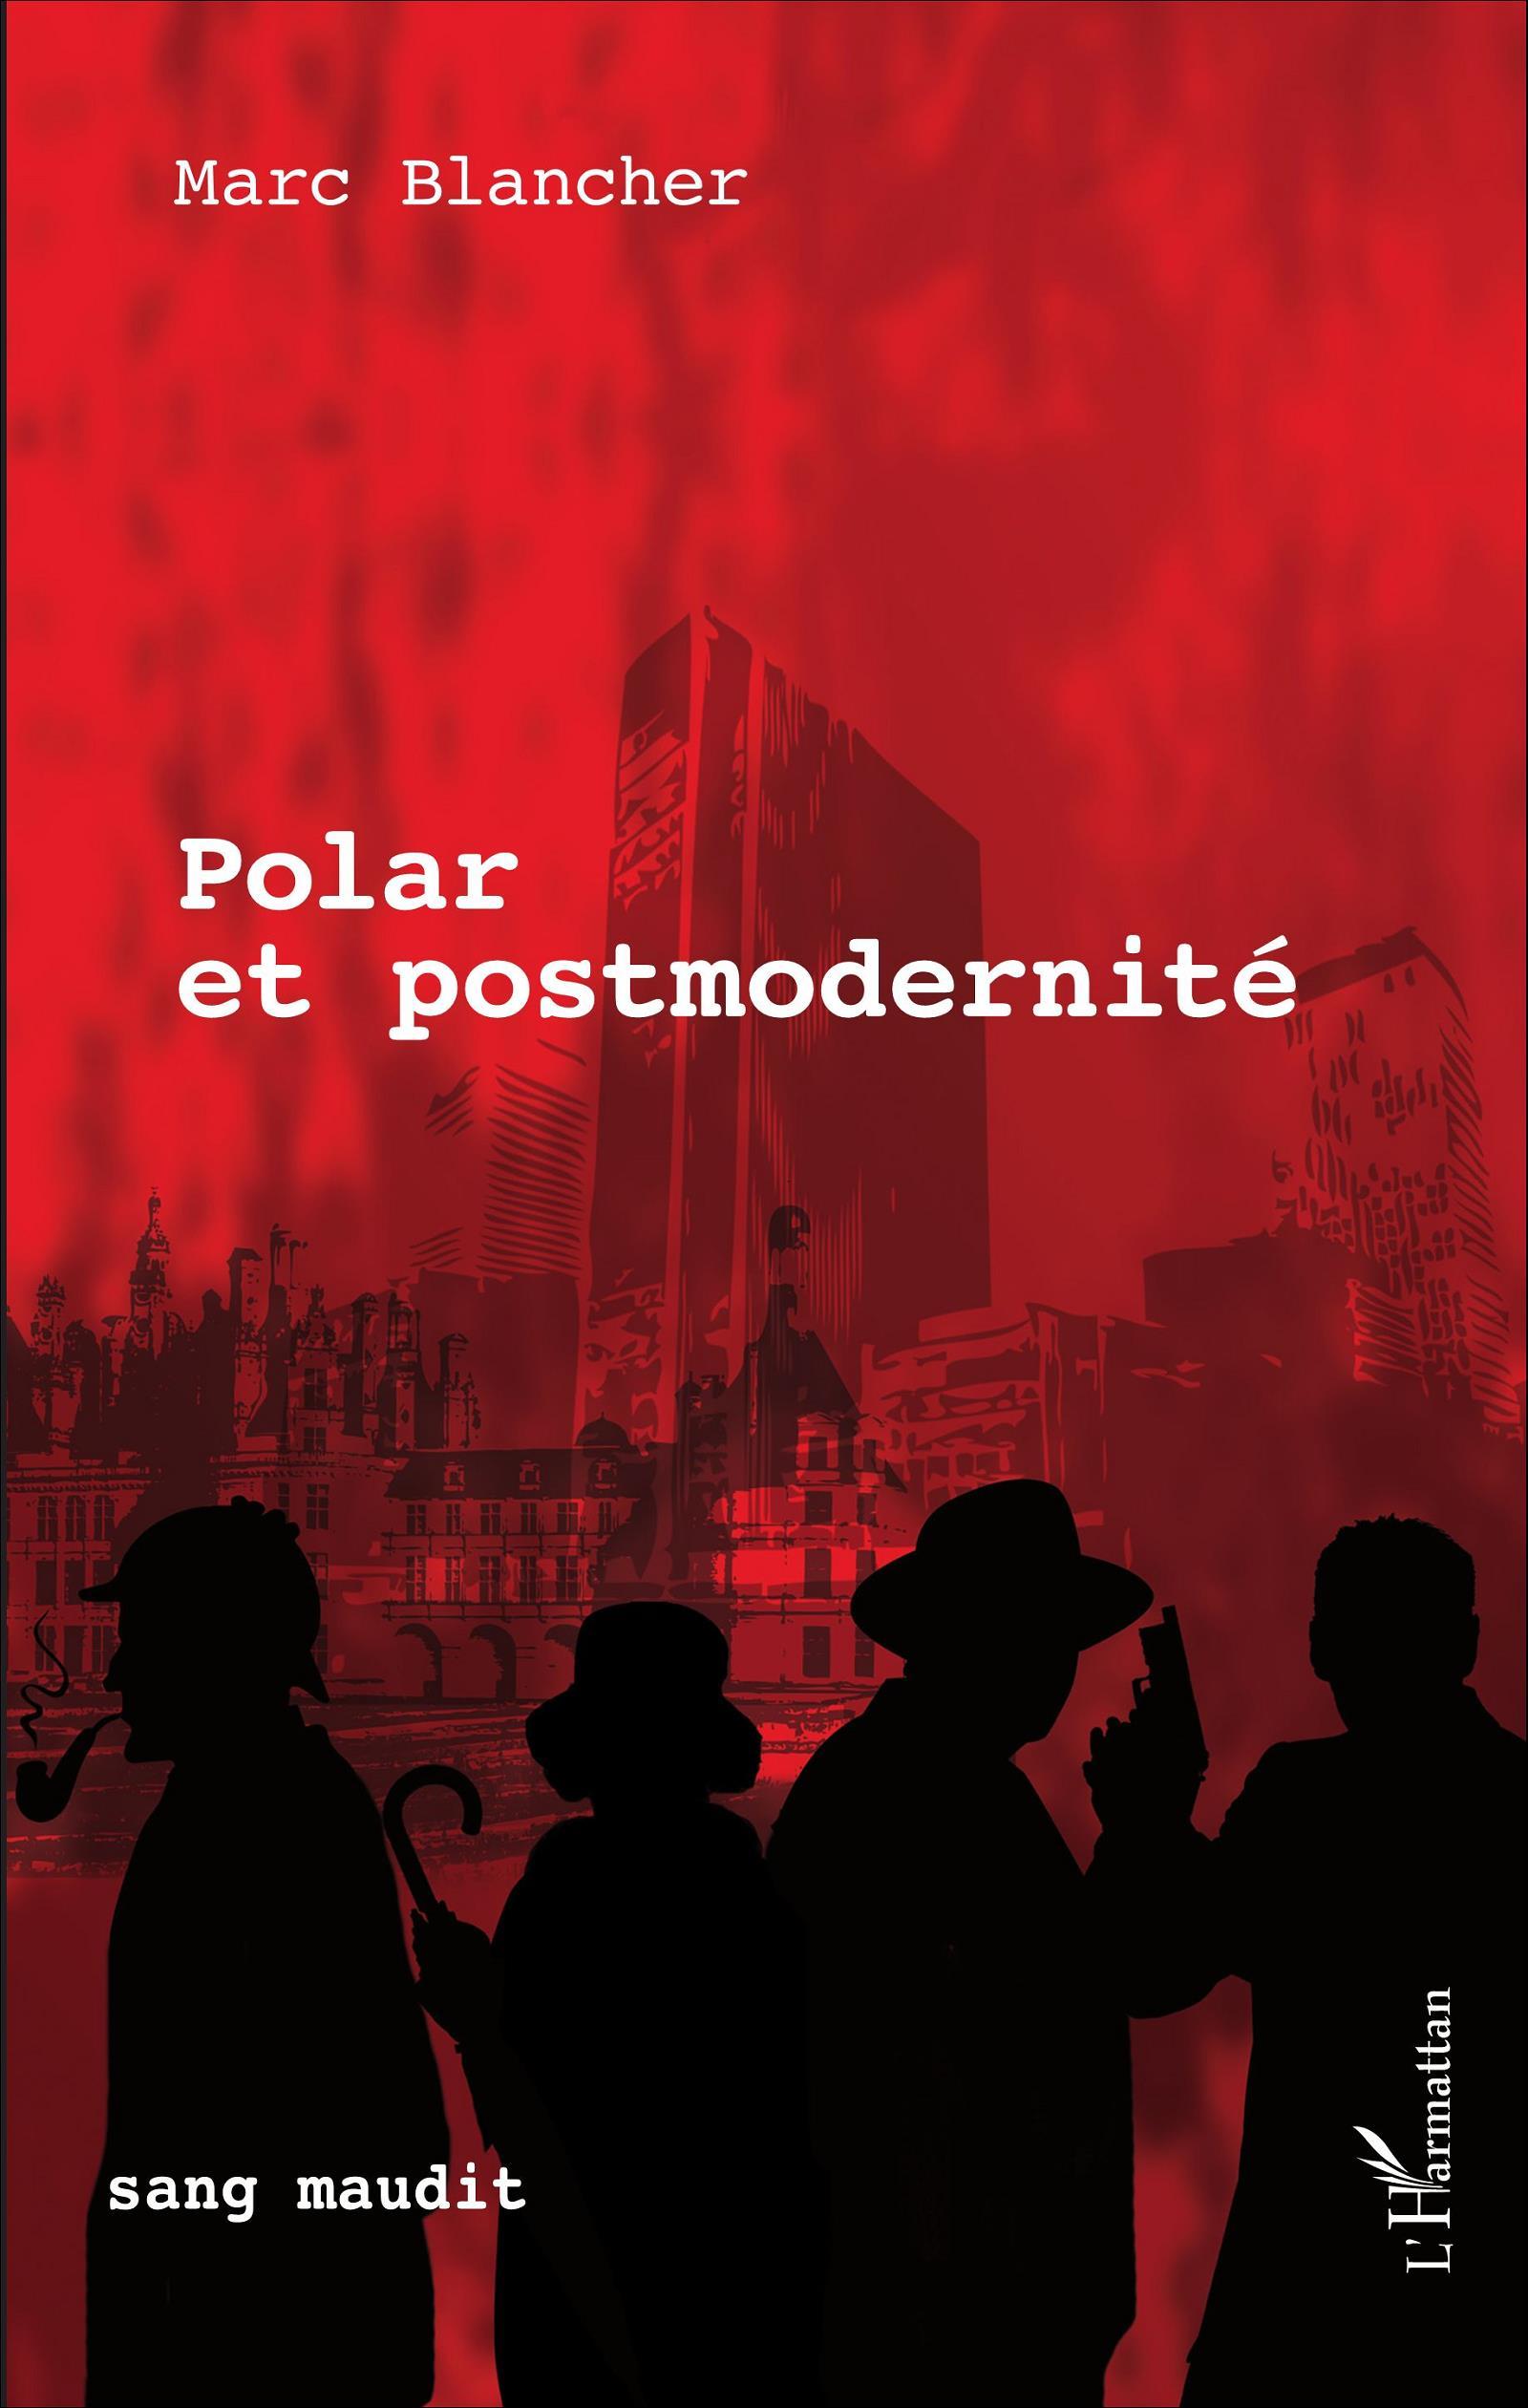 M. Blancher, Polar et postmodernité